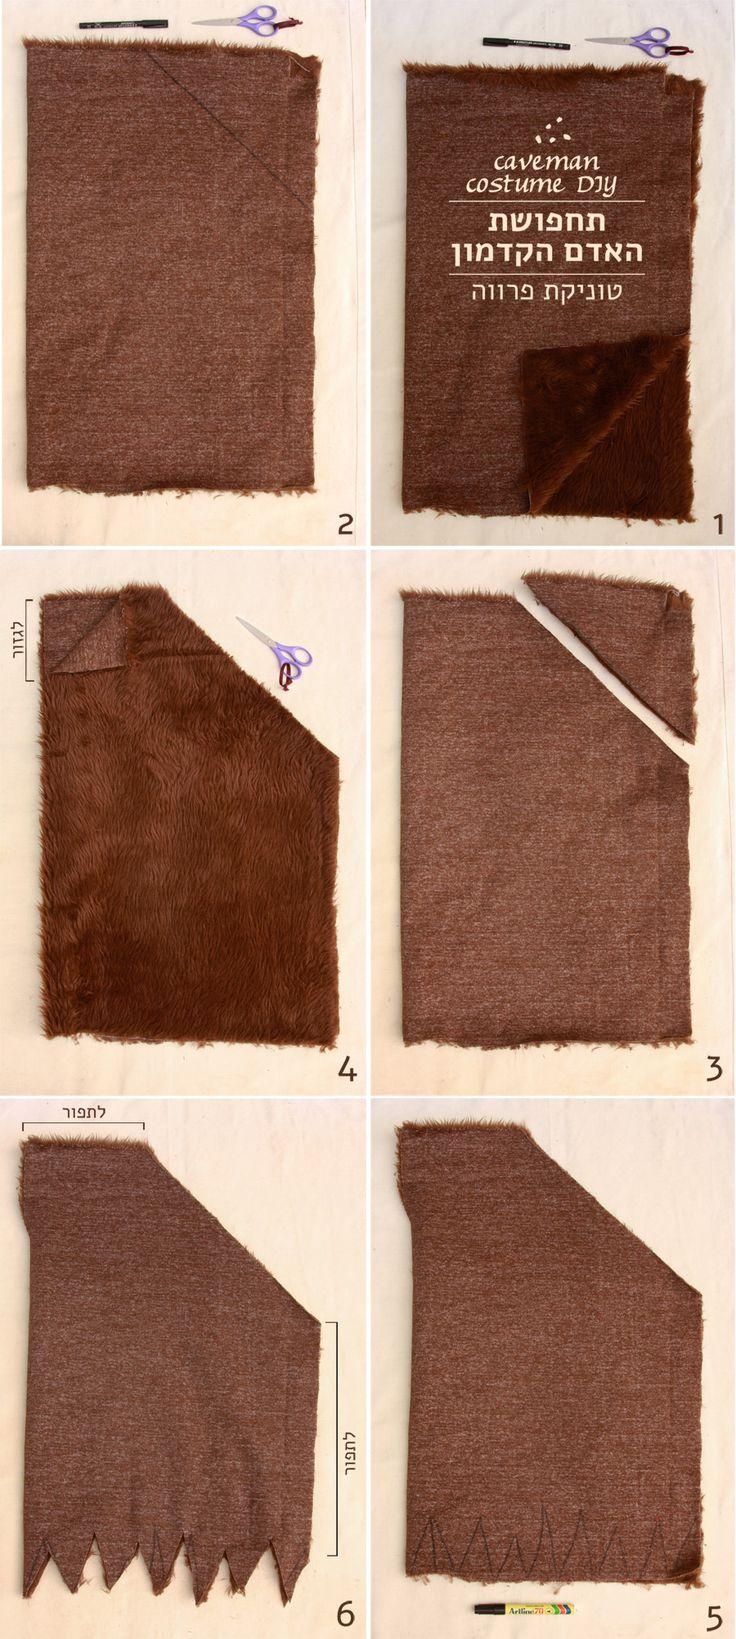 caveman costume DIY תחפושת: האדם הקדמון (והקבאב הרומני) |  בלוג סימני דרך naamasimanim.co.il